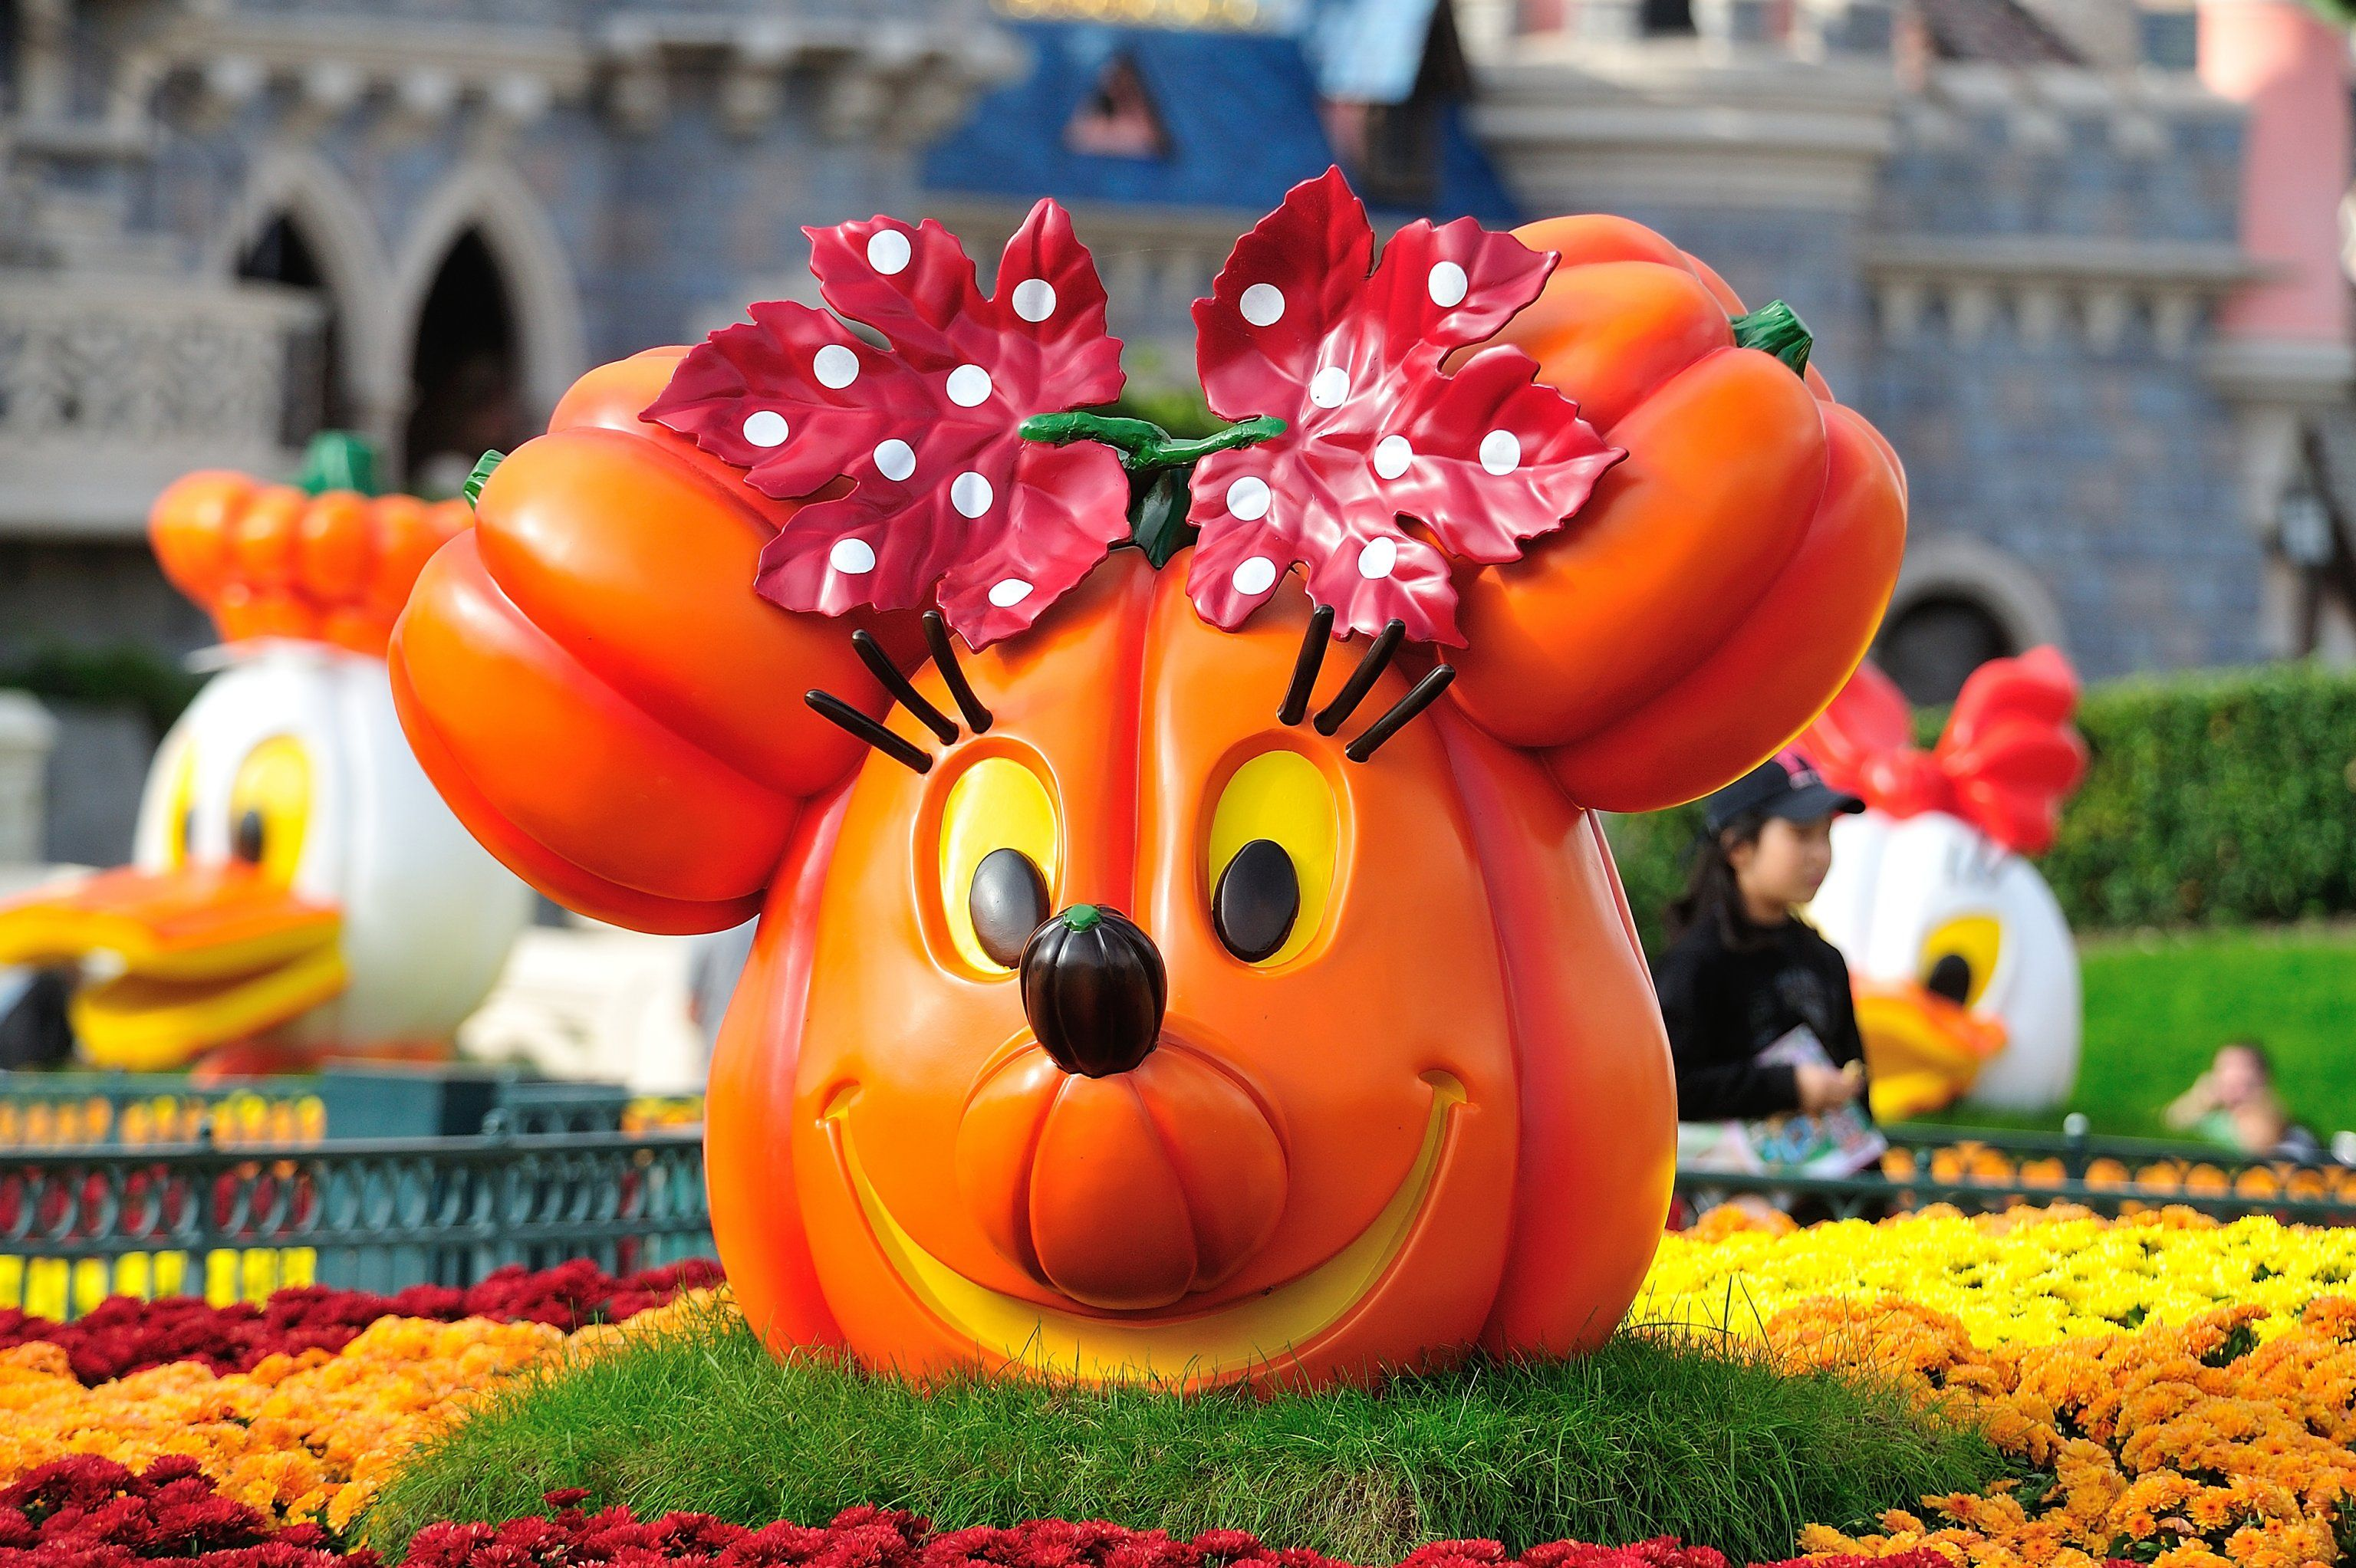 Pumpkins at Disneyland Paris